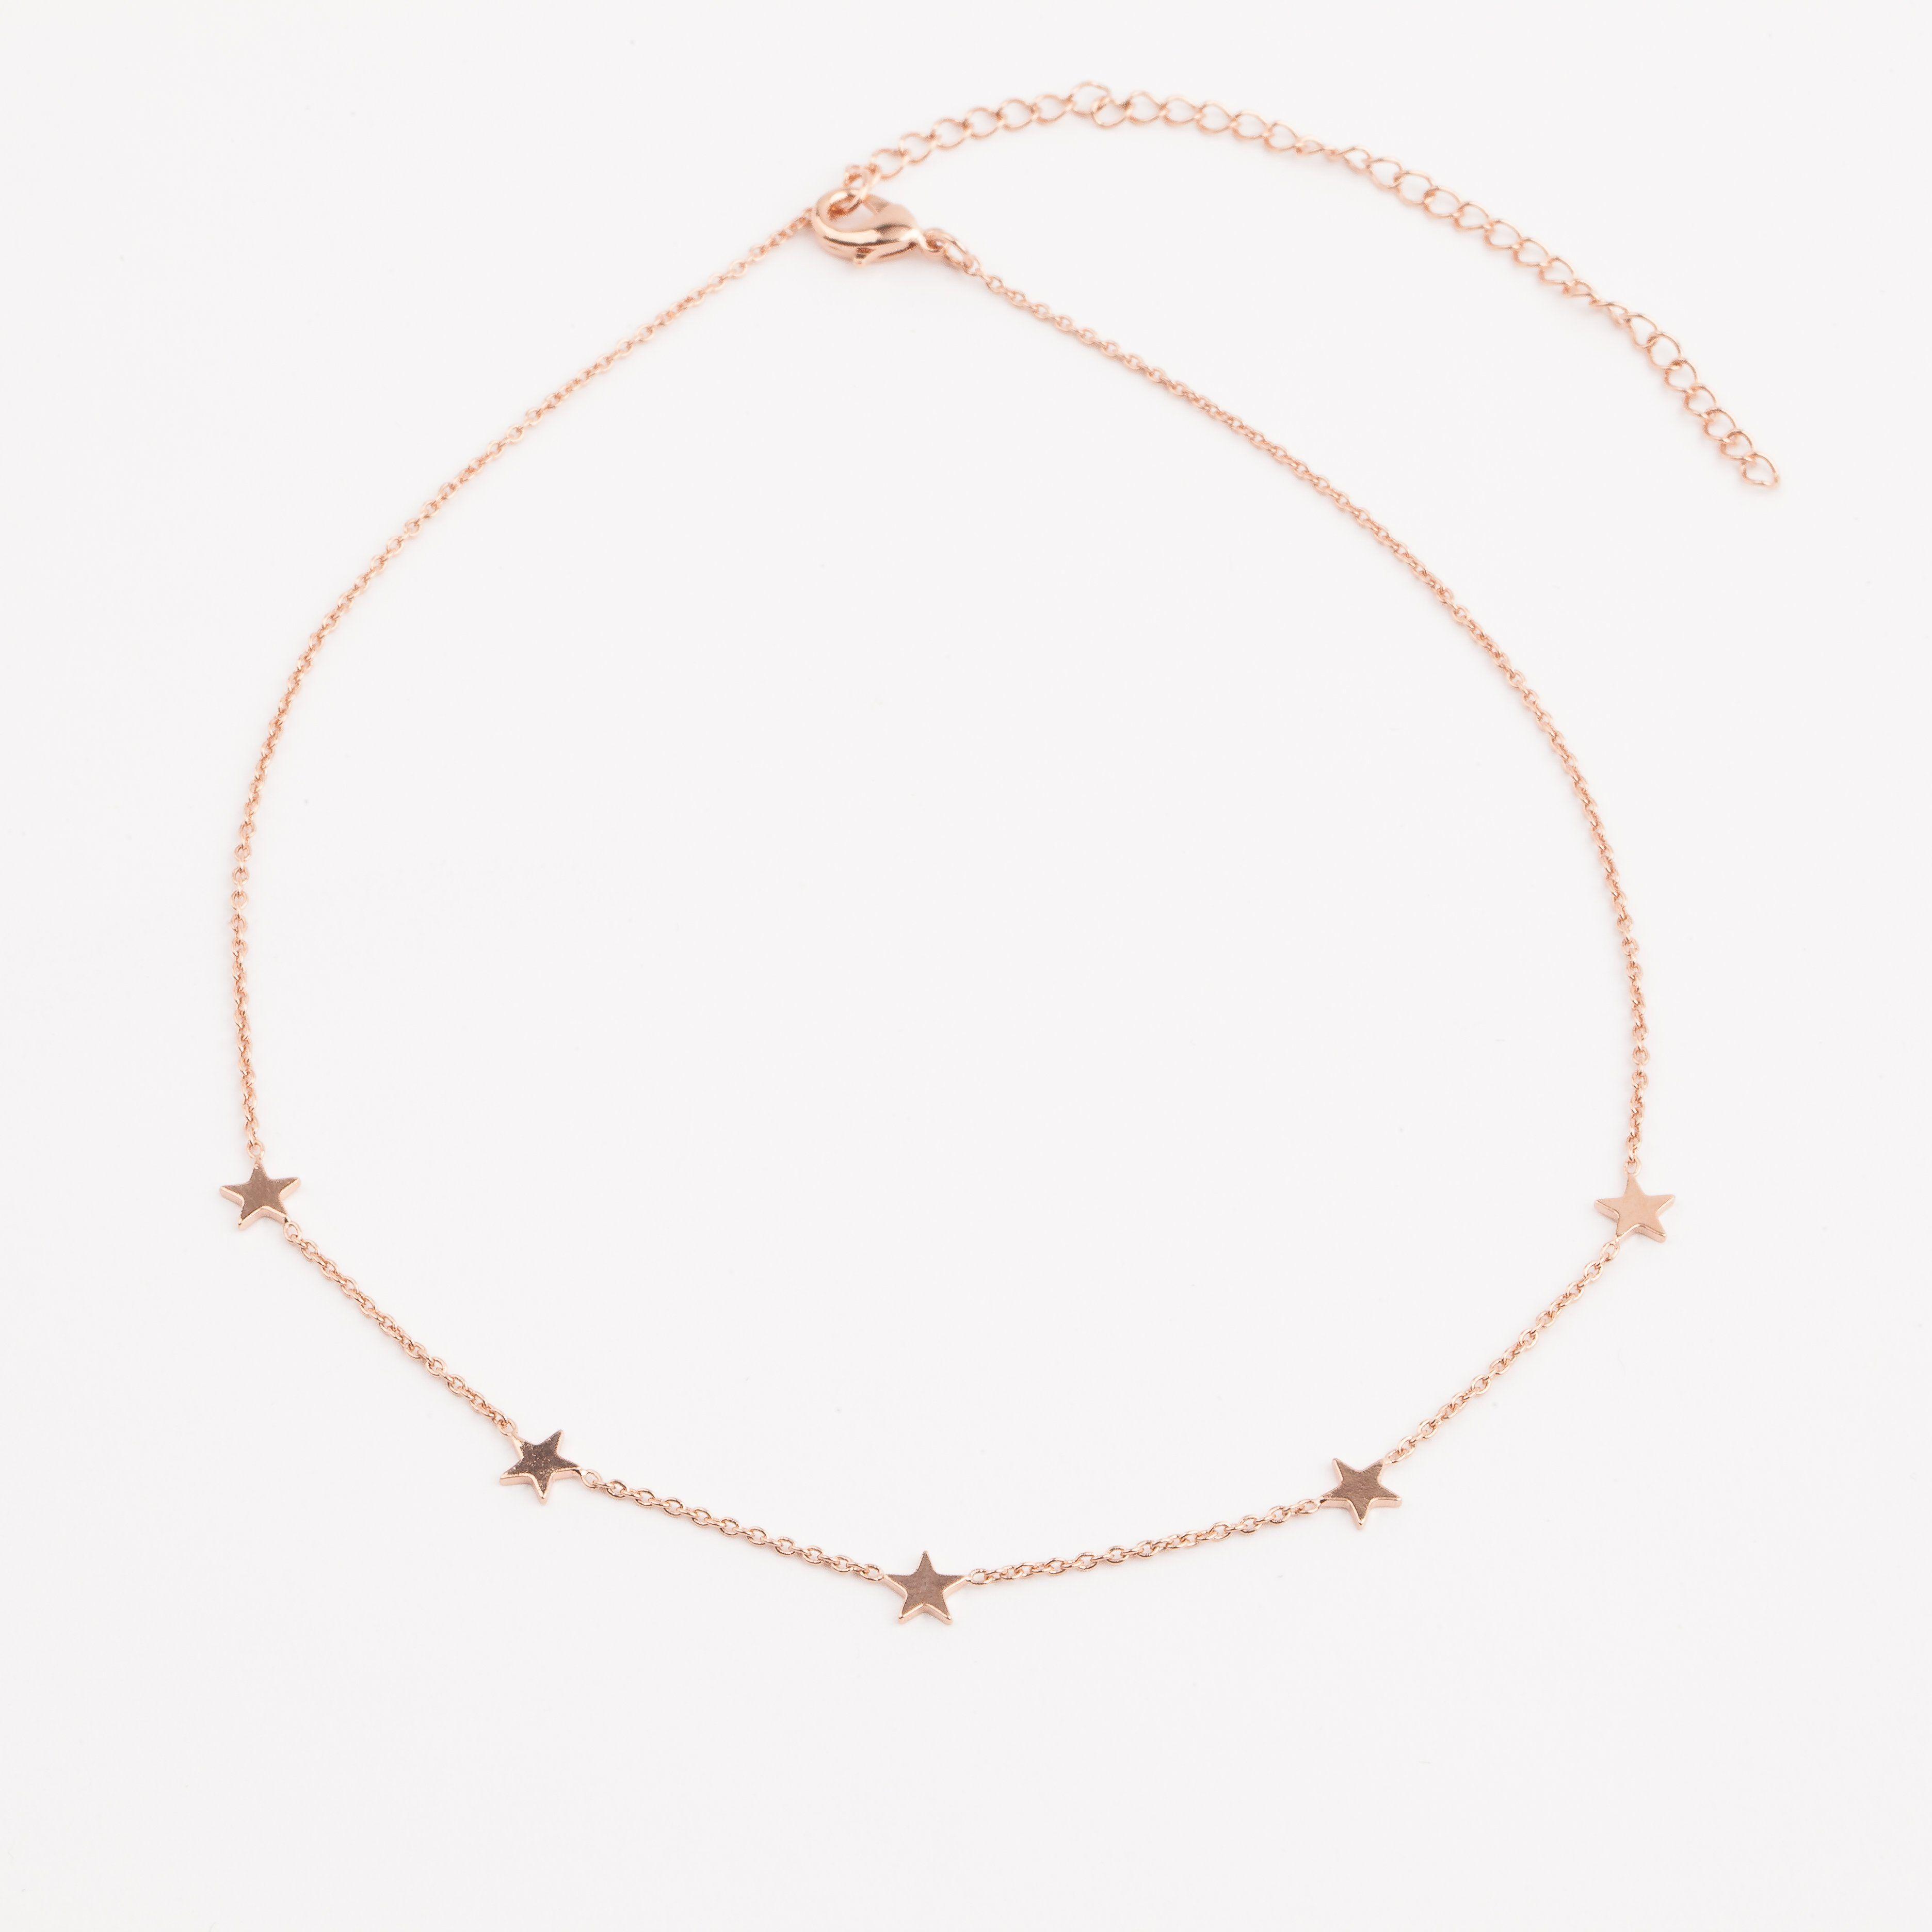 Rose Gold Paige Choker Necklace Choker Sterling silver and Choker